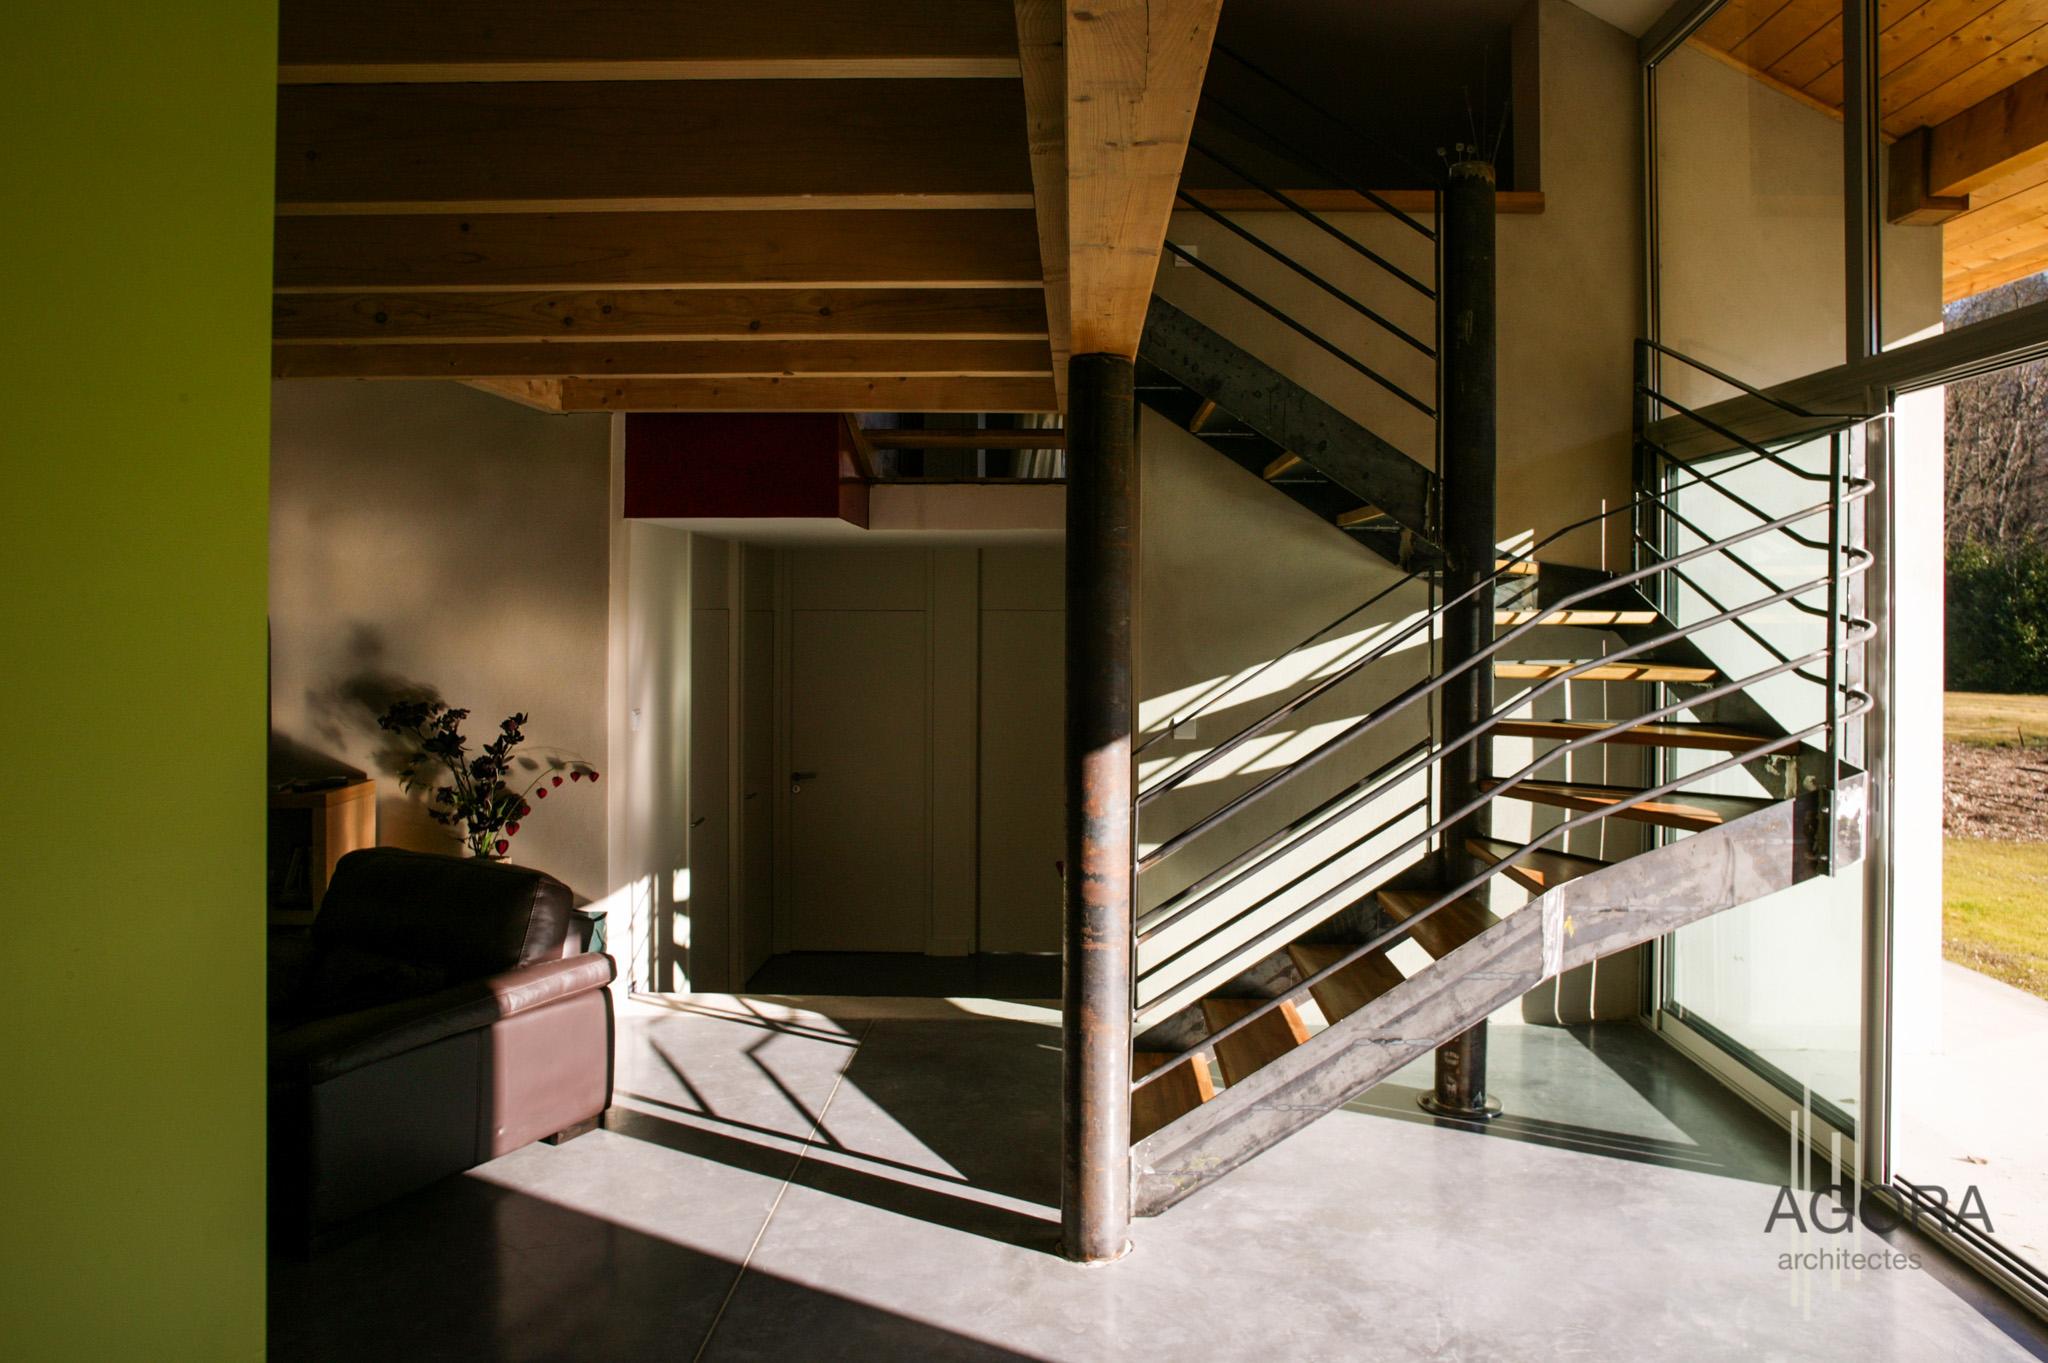 villa p uriage 38 agora architectes grenoble agora architectes grenoble. Black Bedroom Furniture Sets. Home Design Ideas